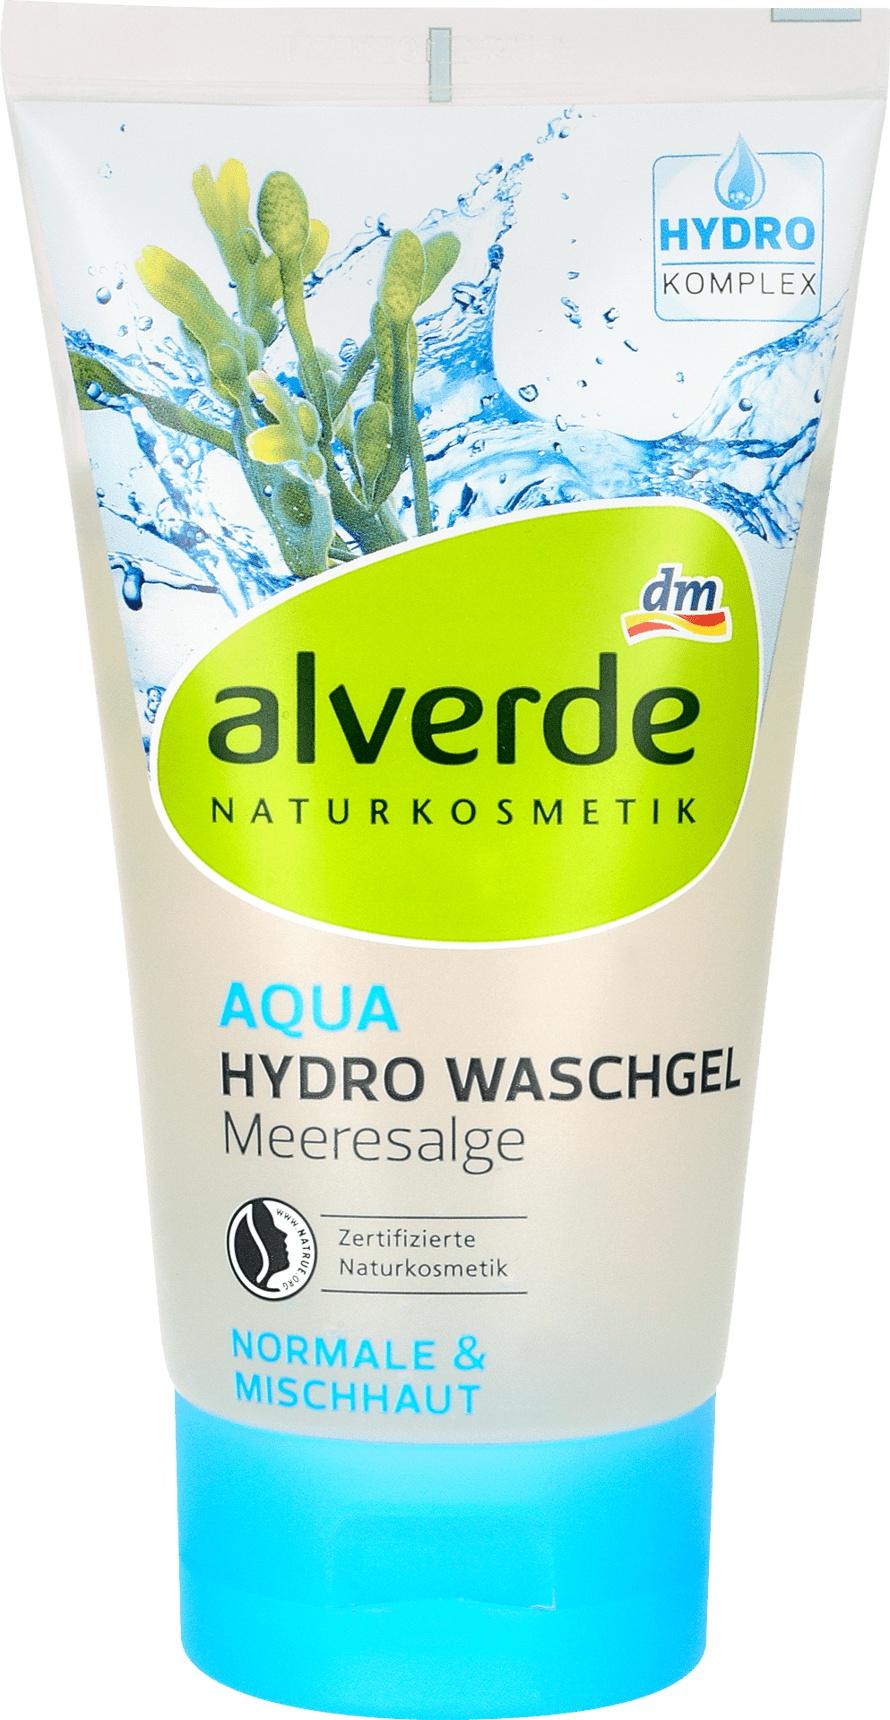 alverde Aqua Hydro Washgel